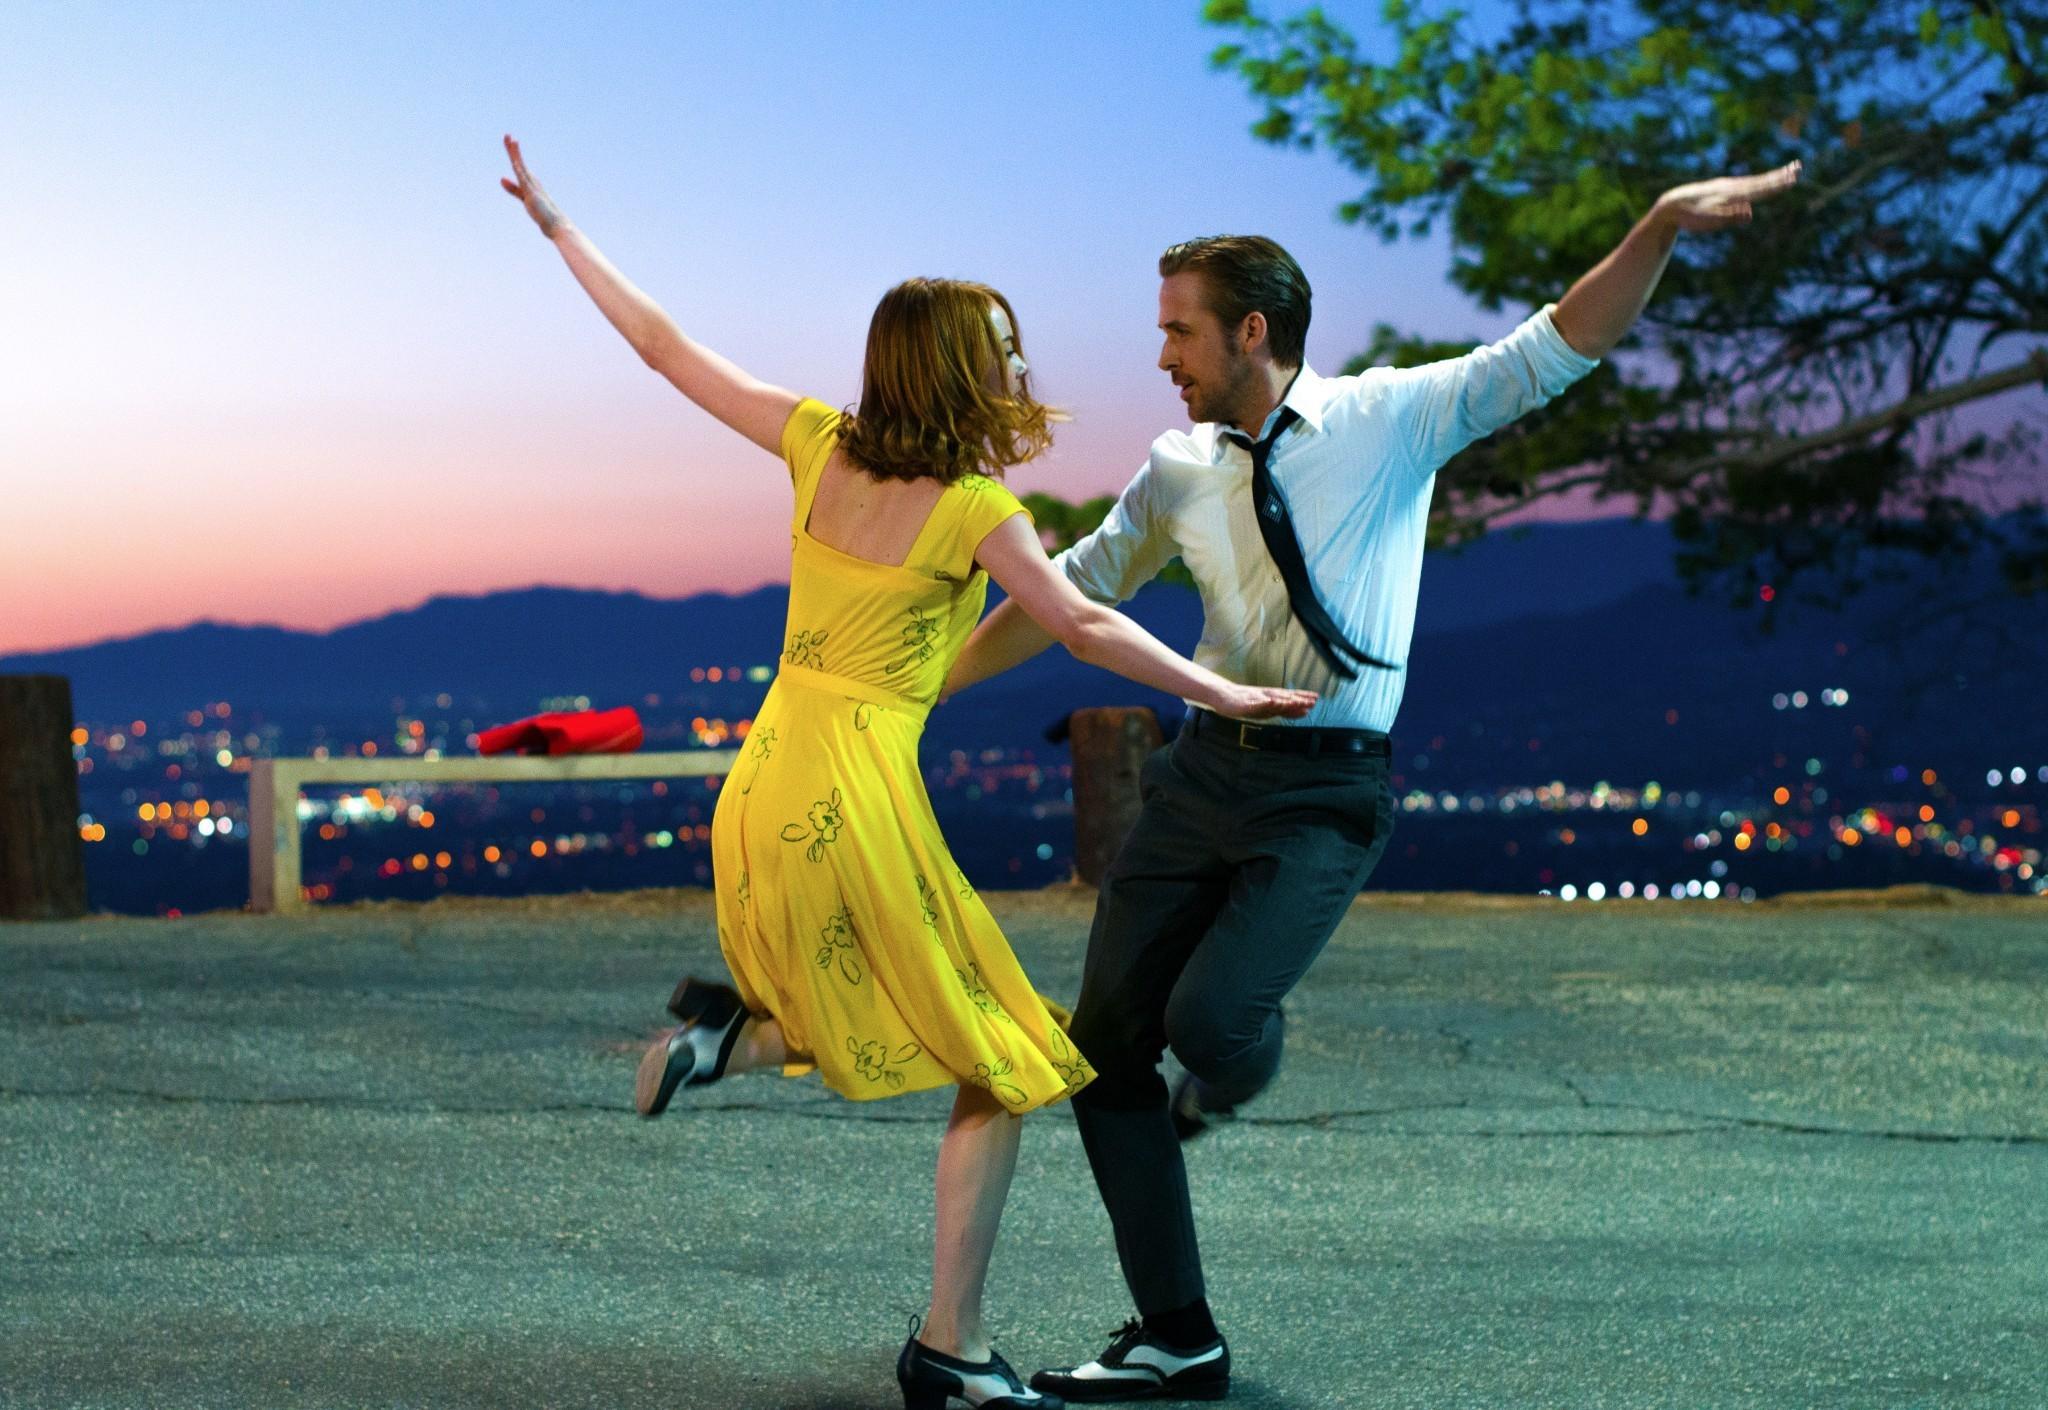 La La Land sees Old Hollywood magic giving way to modern melancholy